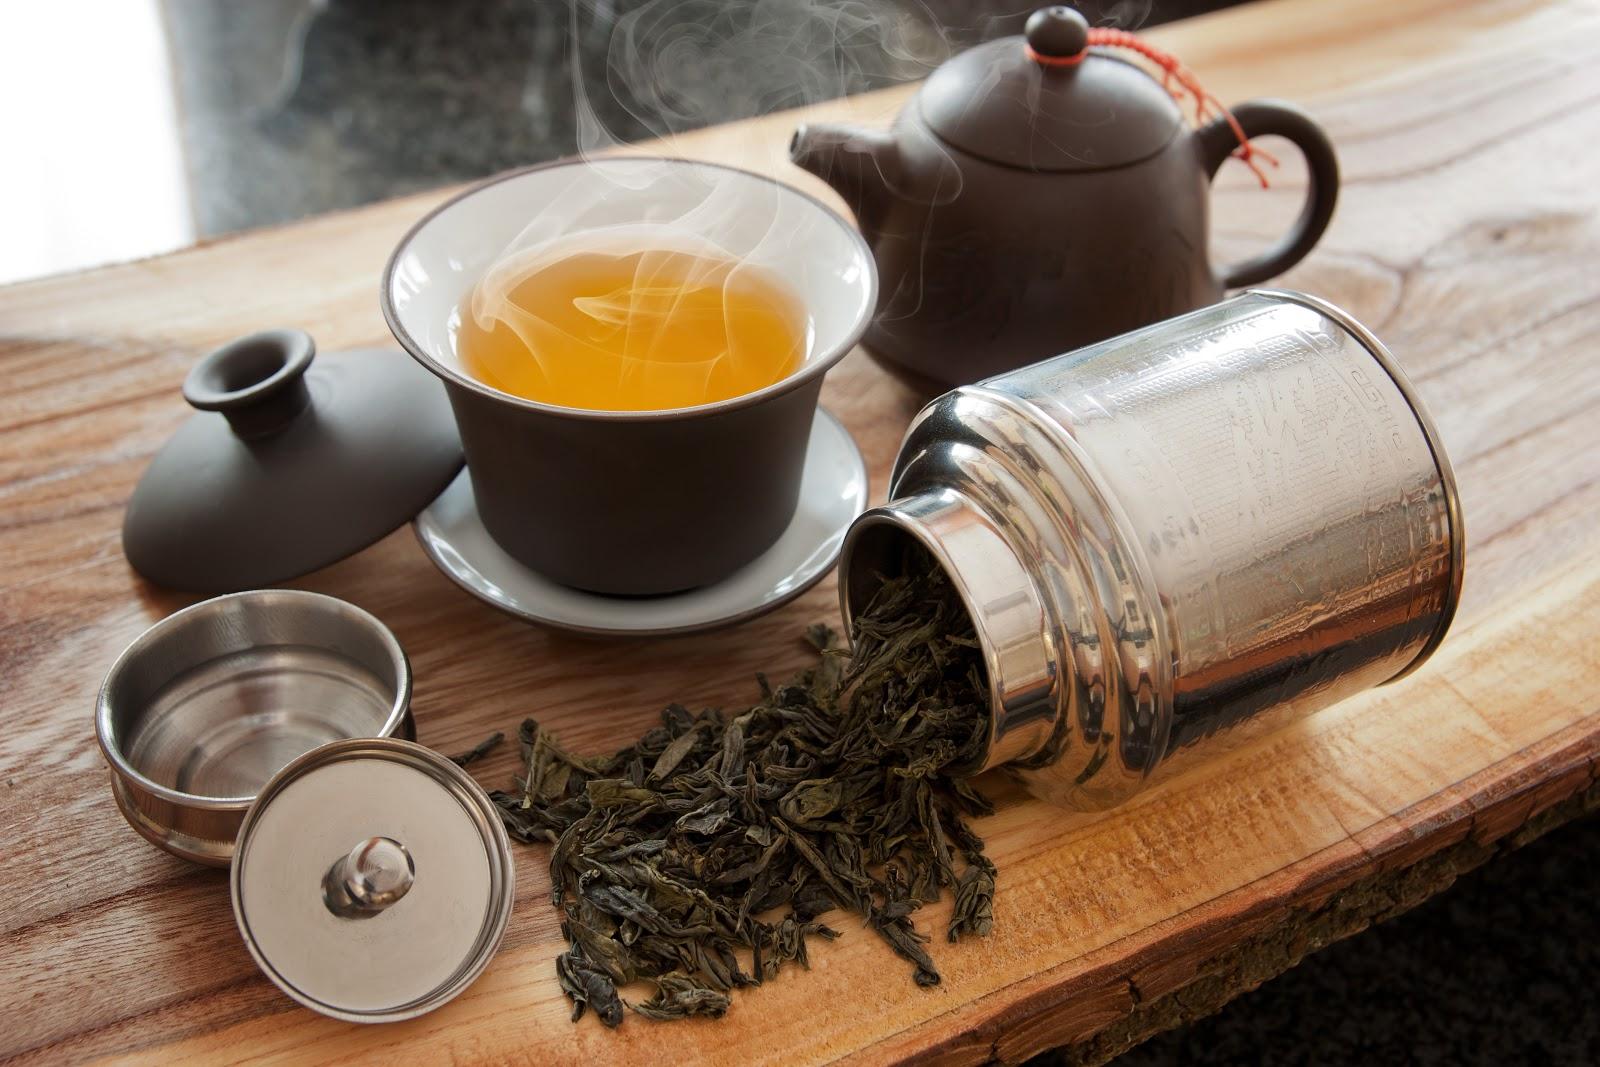 bancha tea and accessories